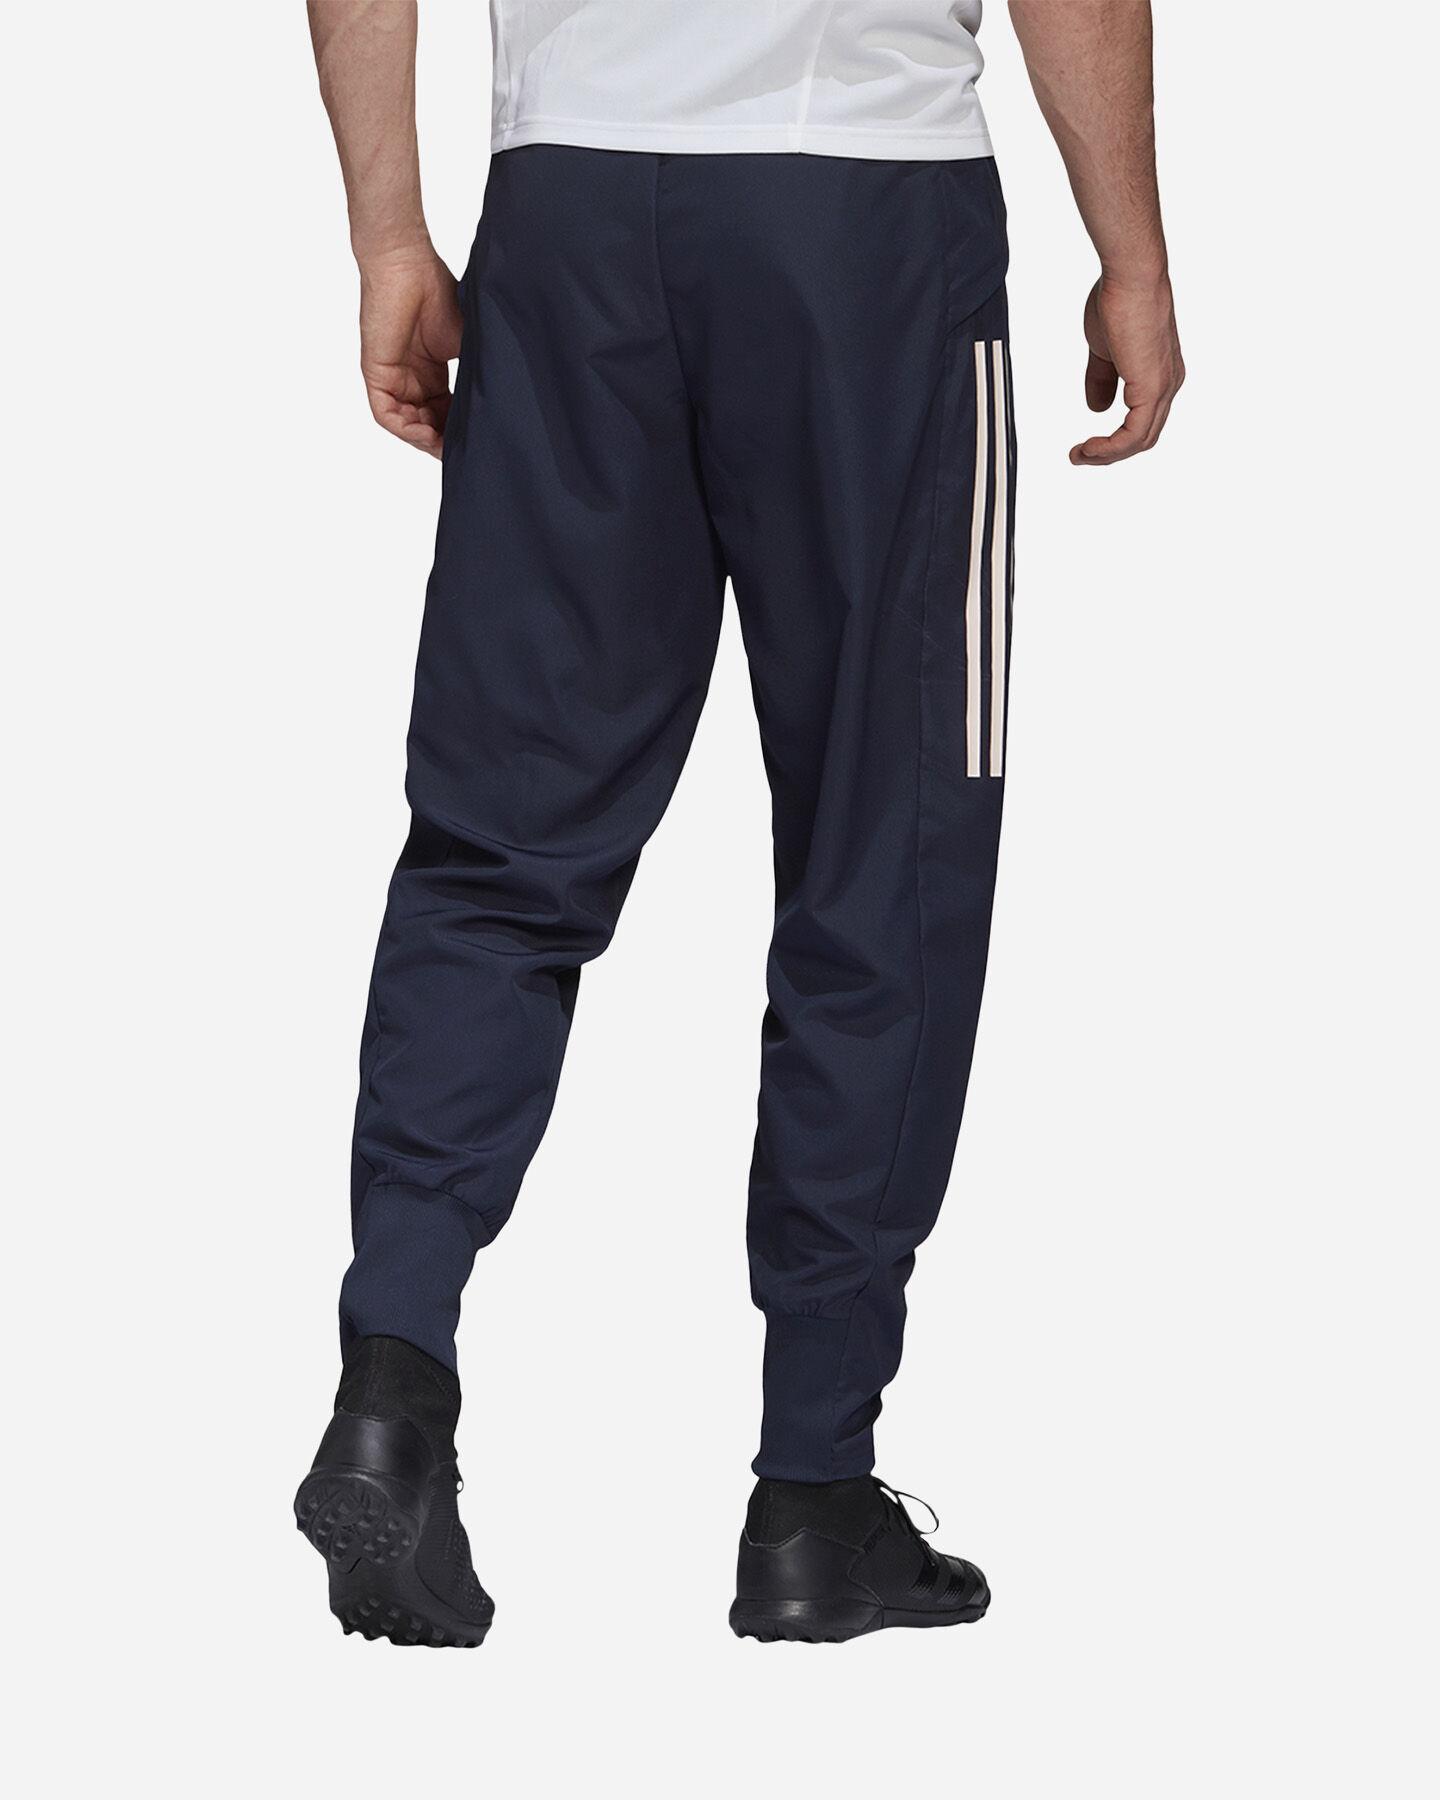 Abbigliamento calcio ADIDAS JUVENTUS PRESENTATION 20/21 M S5217513 scatto 4